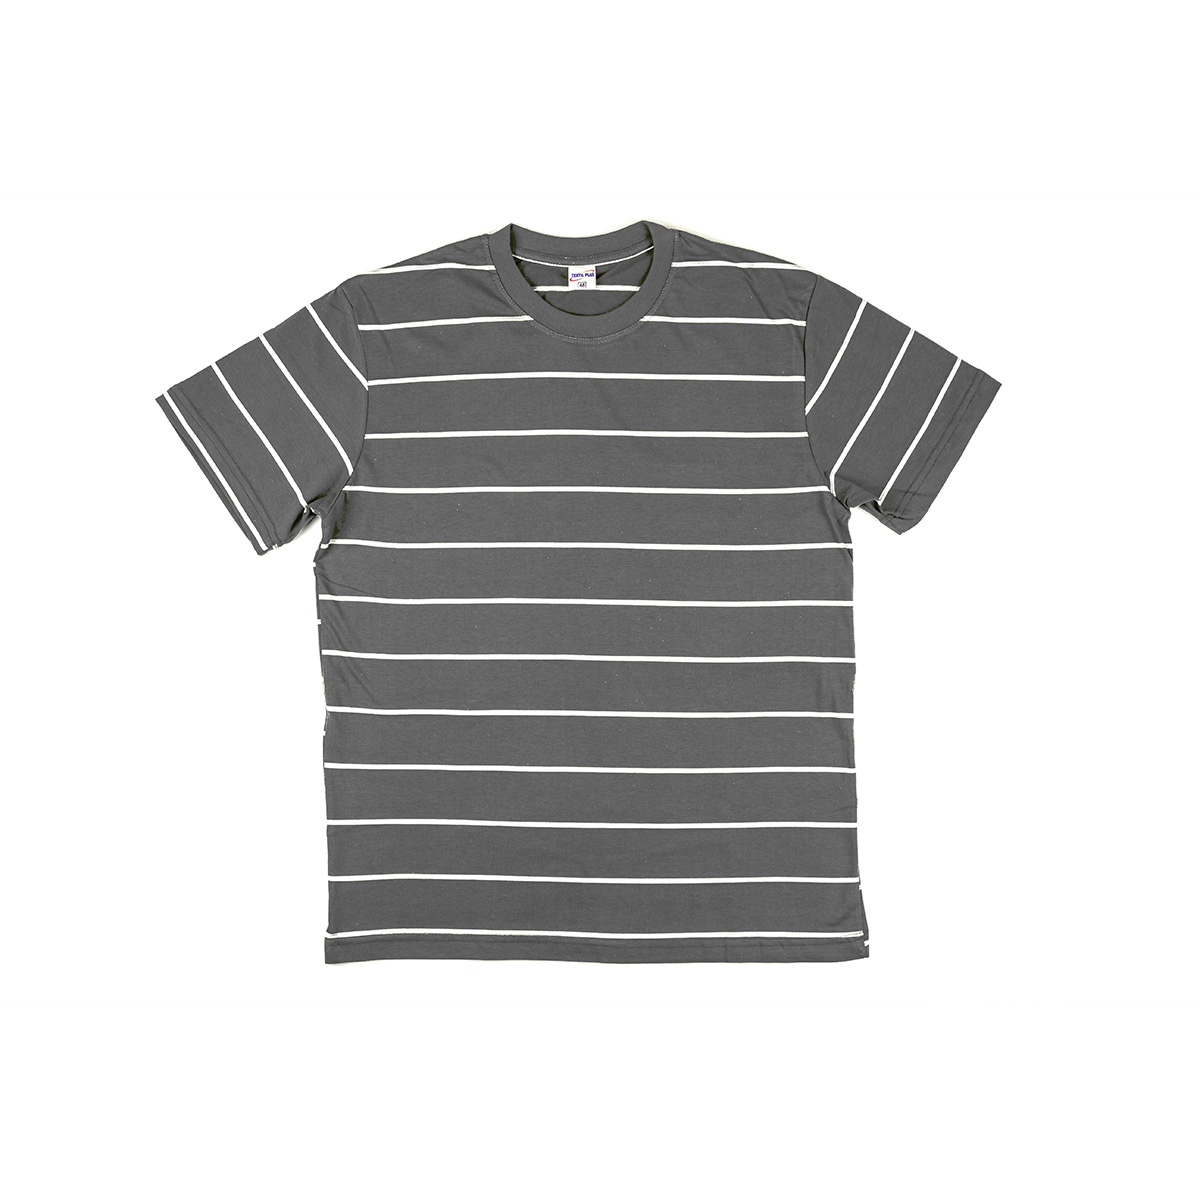 "Мужская футболка ""Simple stripe"", цвет Оранжевый в полоску, размер 48 Узбекистан ""Textil Plus"""